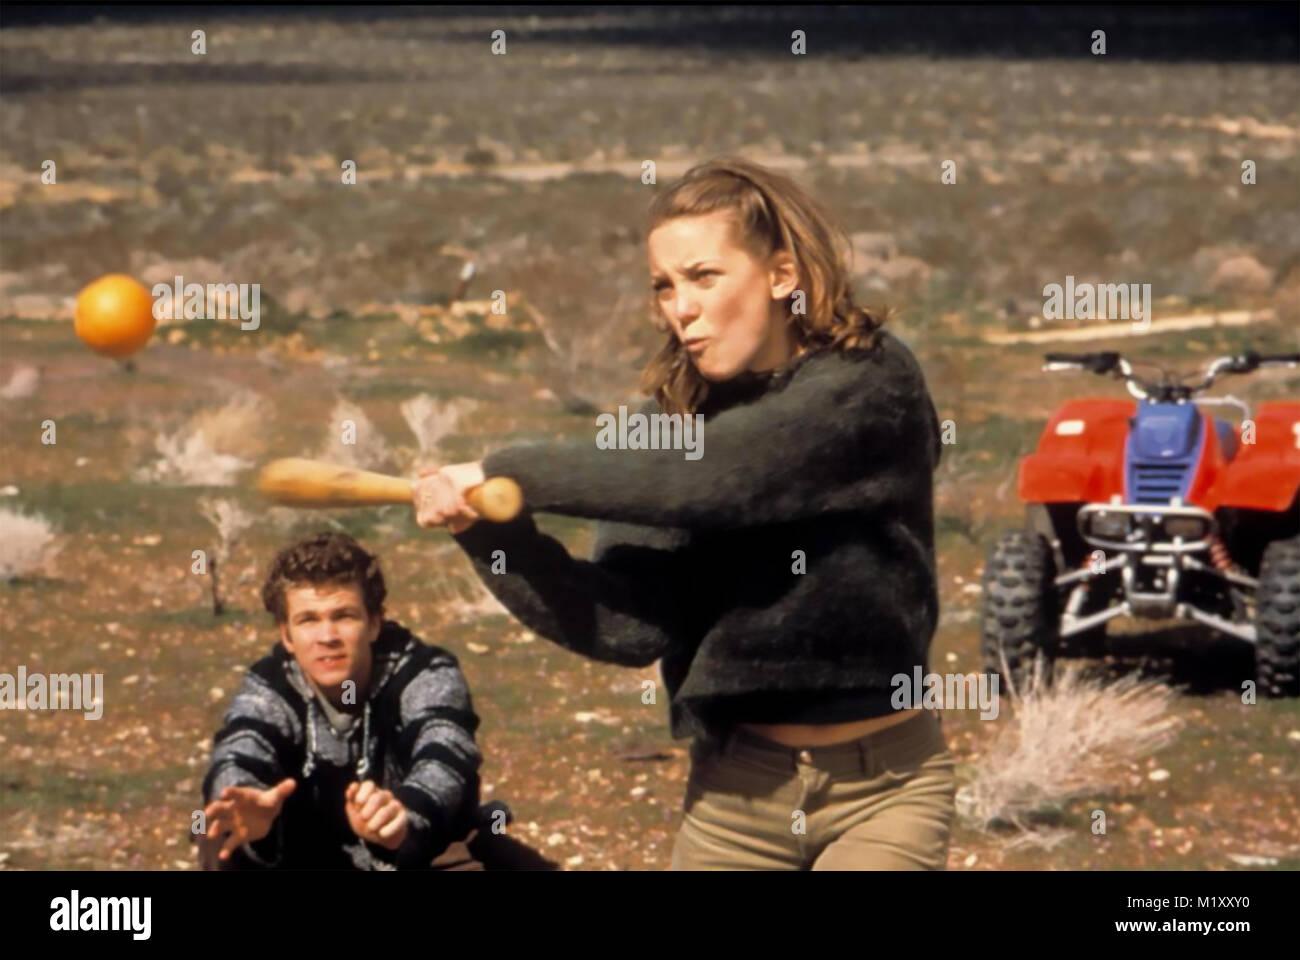 DESERT BLUE 1998 Ignite Entertainment film with Kate Hudson and Brendan Sexton - Stock Image